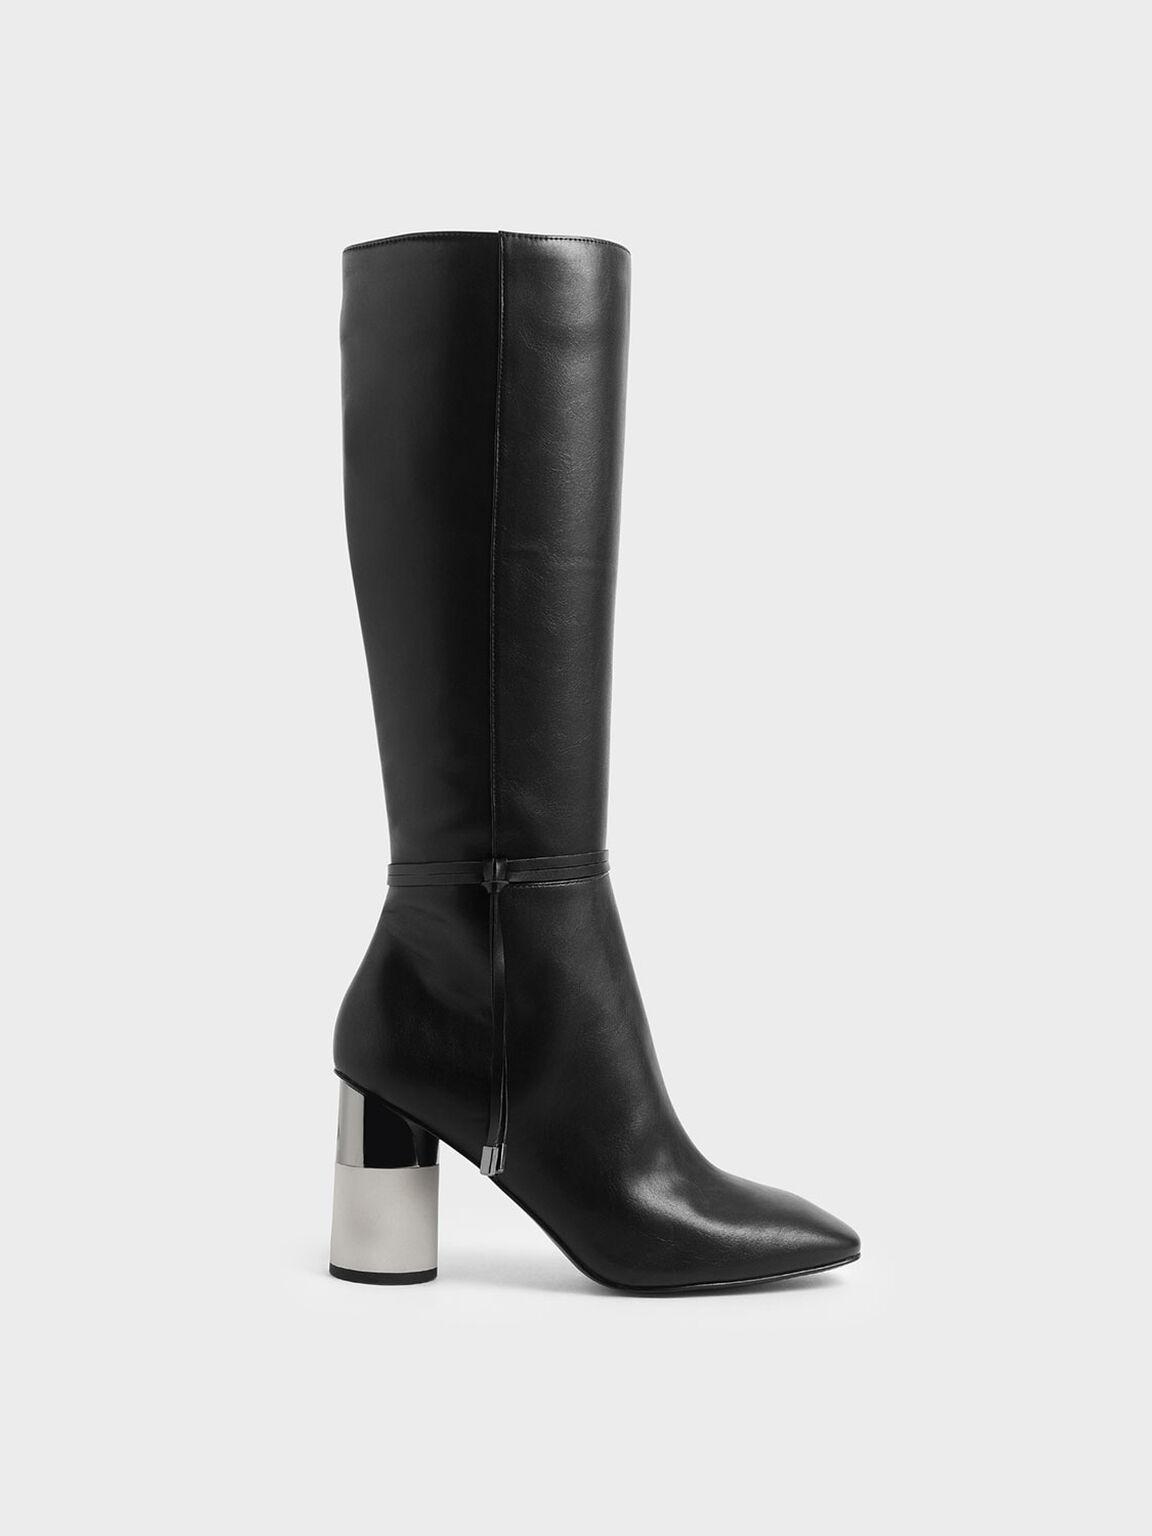 Concrete Heel Knee-High Boots, Black, hi-res